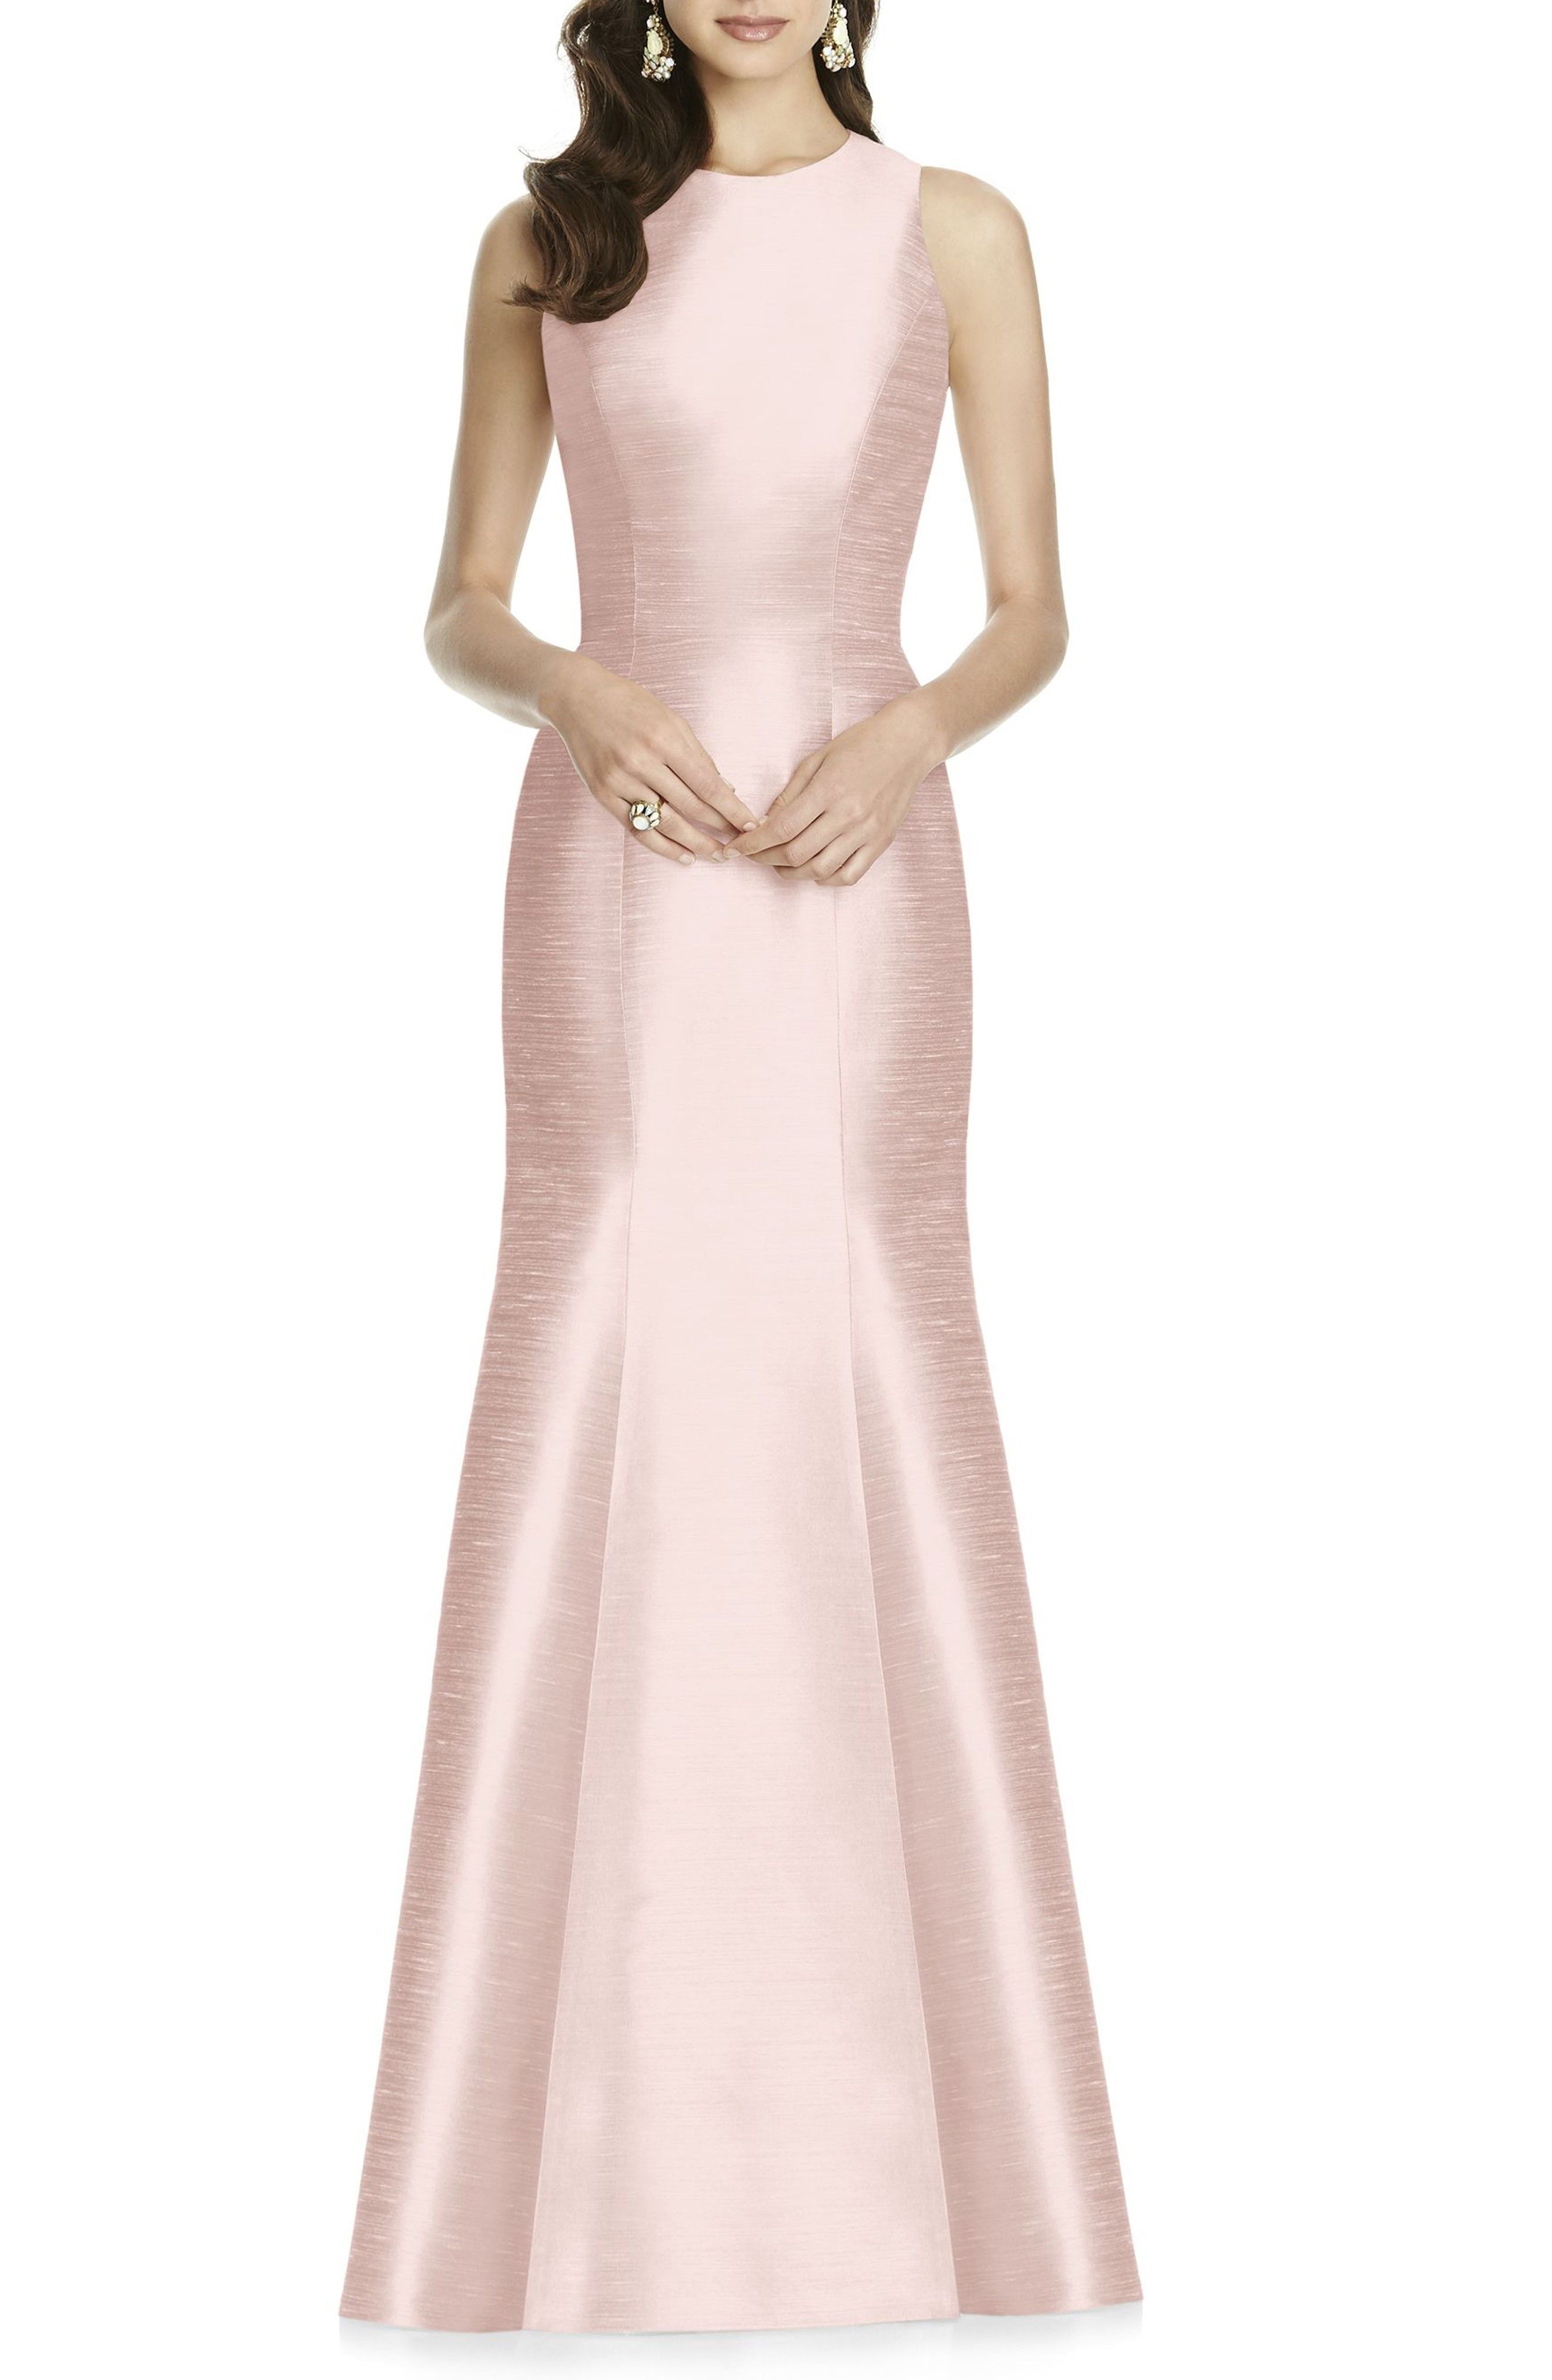 e21b22a3b Blush Bridesmaid Dress Trumpet Gown, Formal Dresses, Wedding Dresses,  Women's Fashion Dresses,